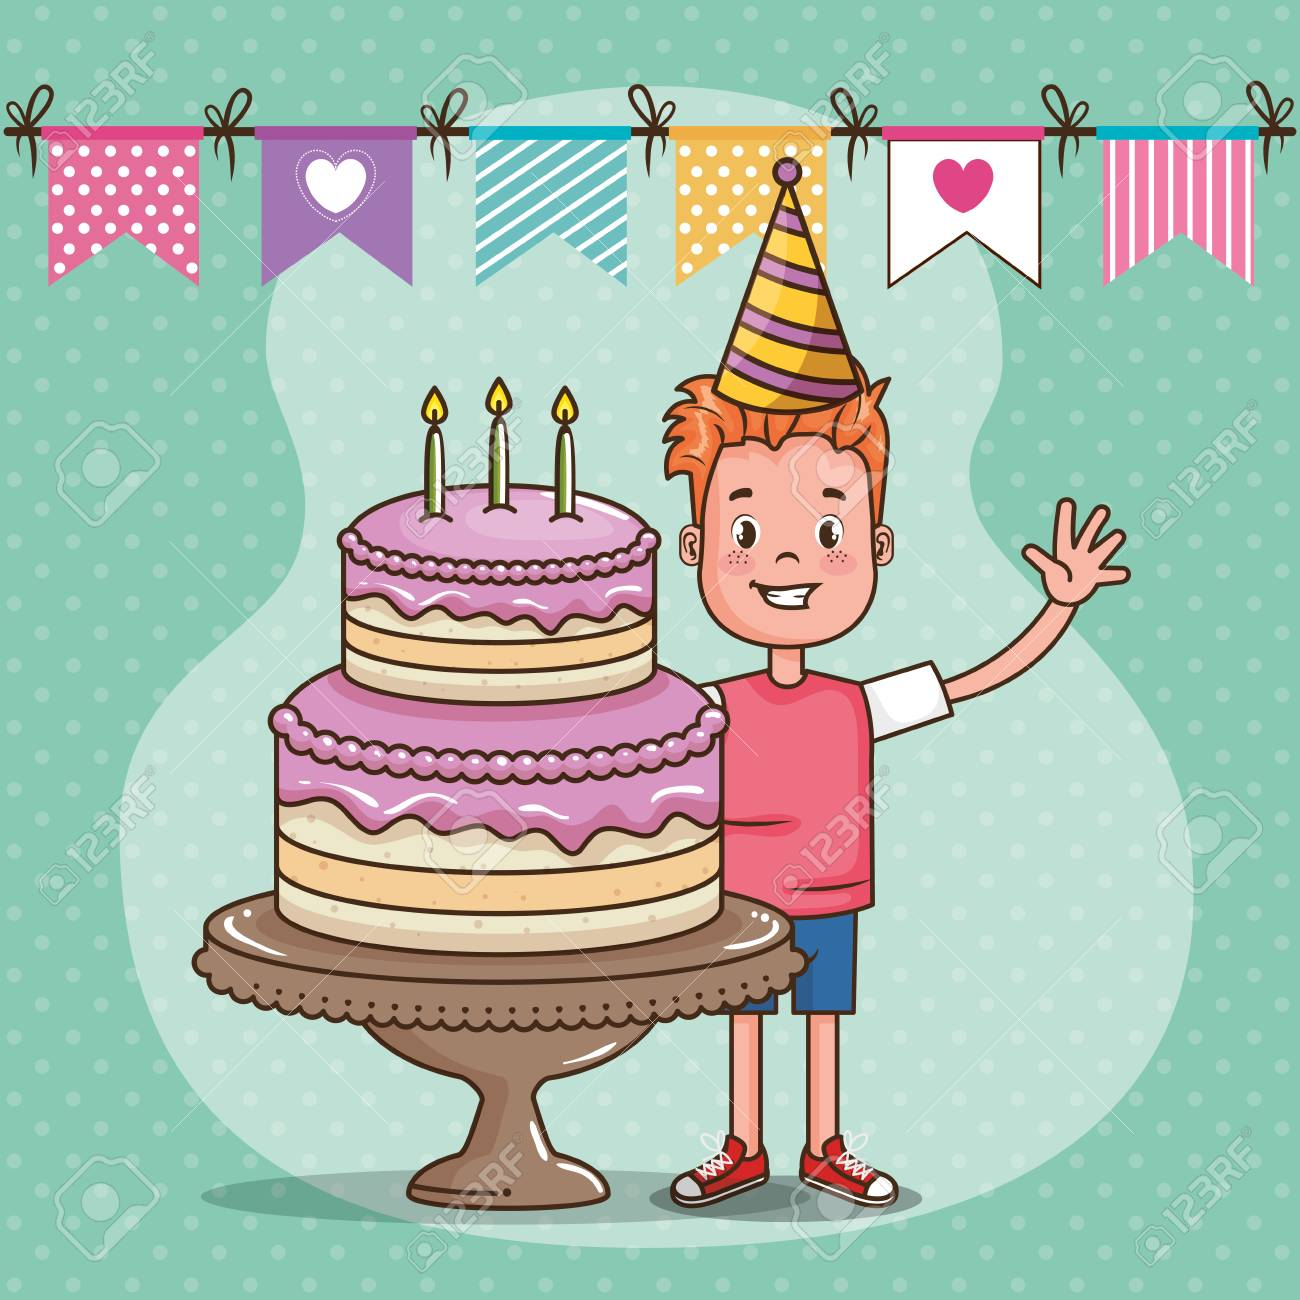 Strange Happy Birthday Card With Little Boy Vector Illustration Design Funny Birthday Cards Online Kookostrdamsfinfo